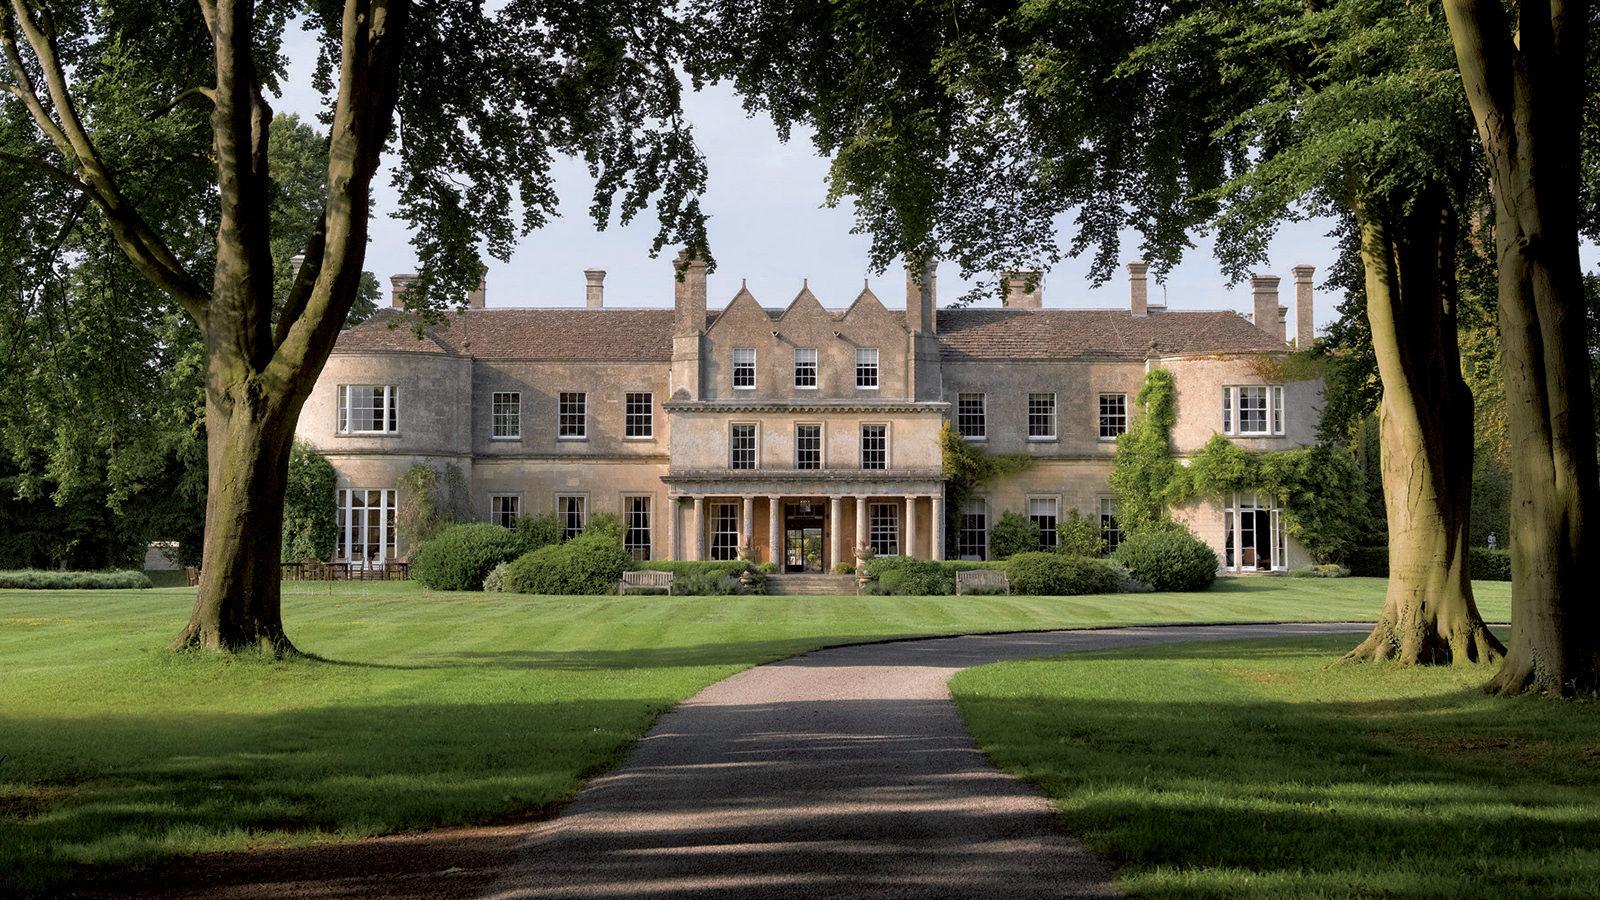 EU-England-Wiltshire-Cotswolds-lucknampark-1-e1485181681181